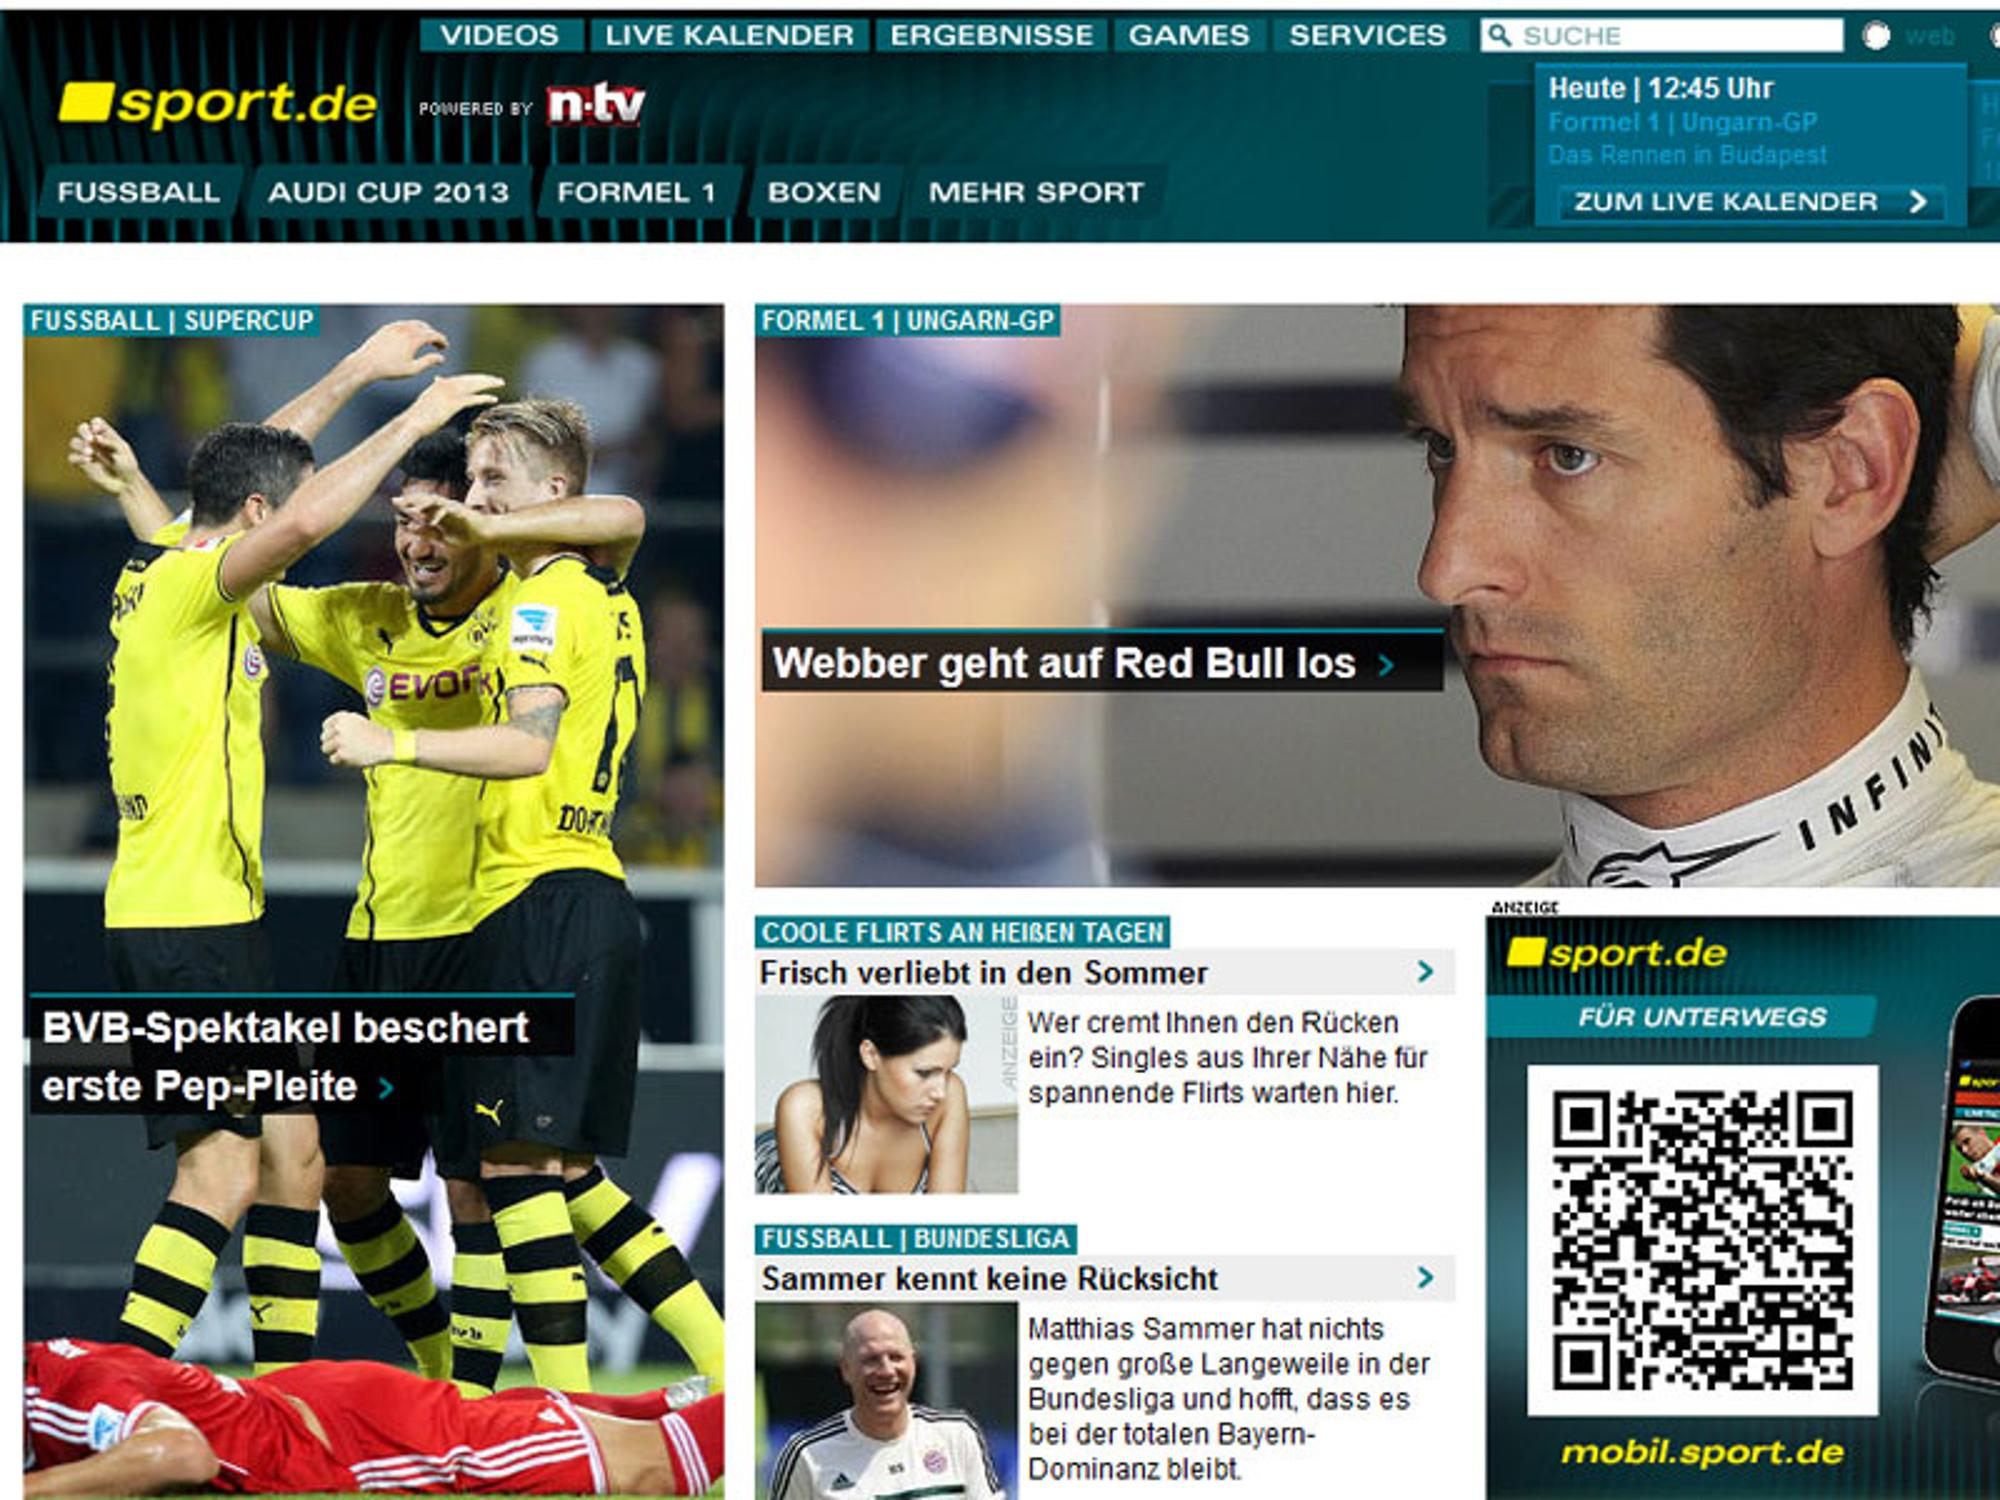 Pep Guardiola Ohrfeige für Thiago Alcantara beim Supercup gegen